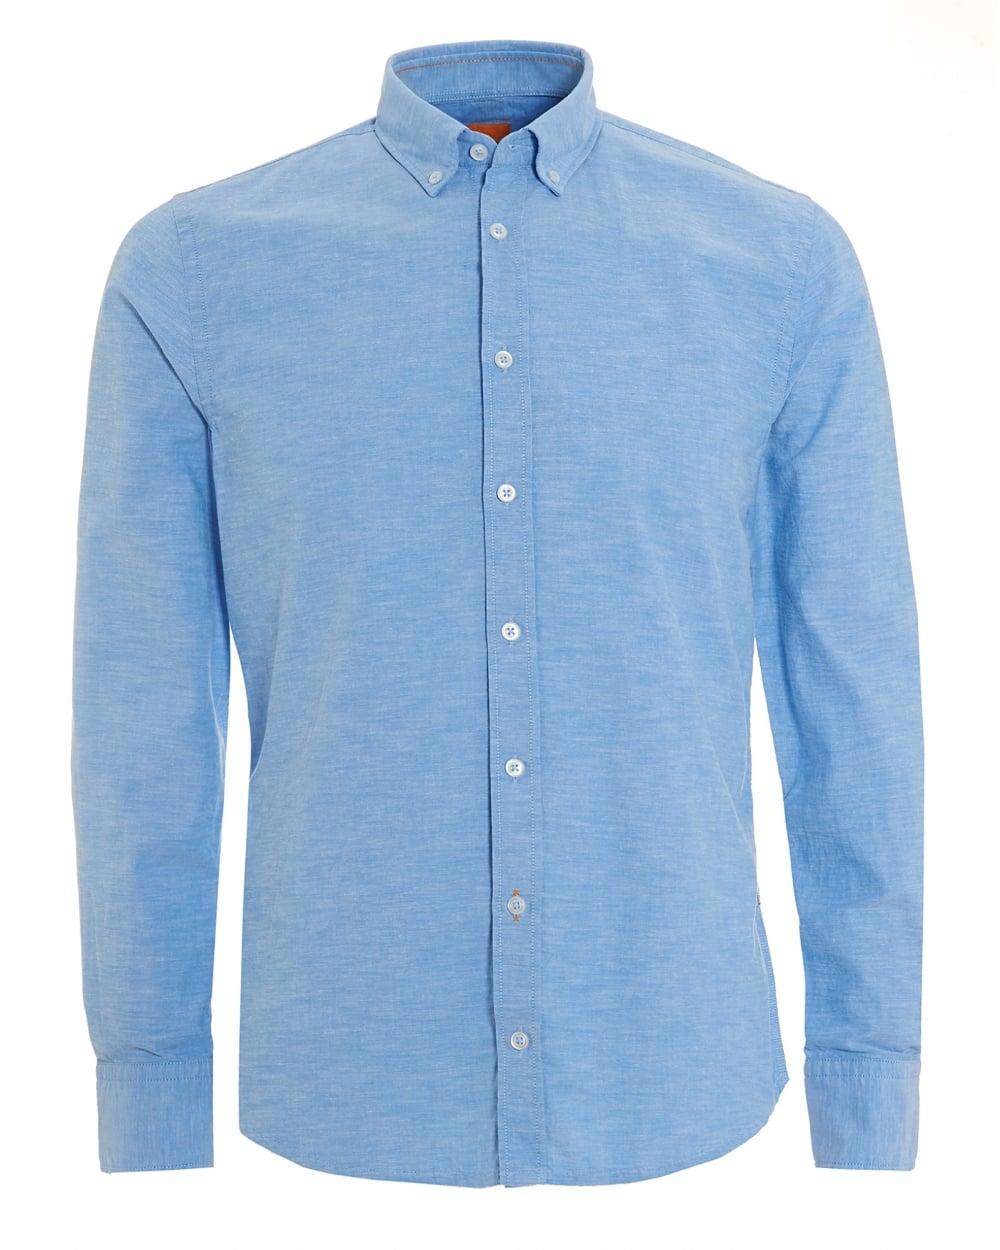 Hugo boss orange mens epreppy slim fit sky blue oxford shirt for Mens blue oxford shirt